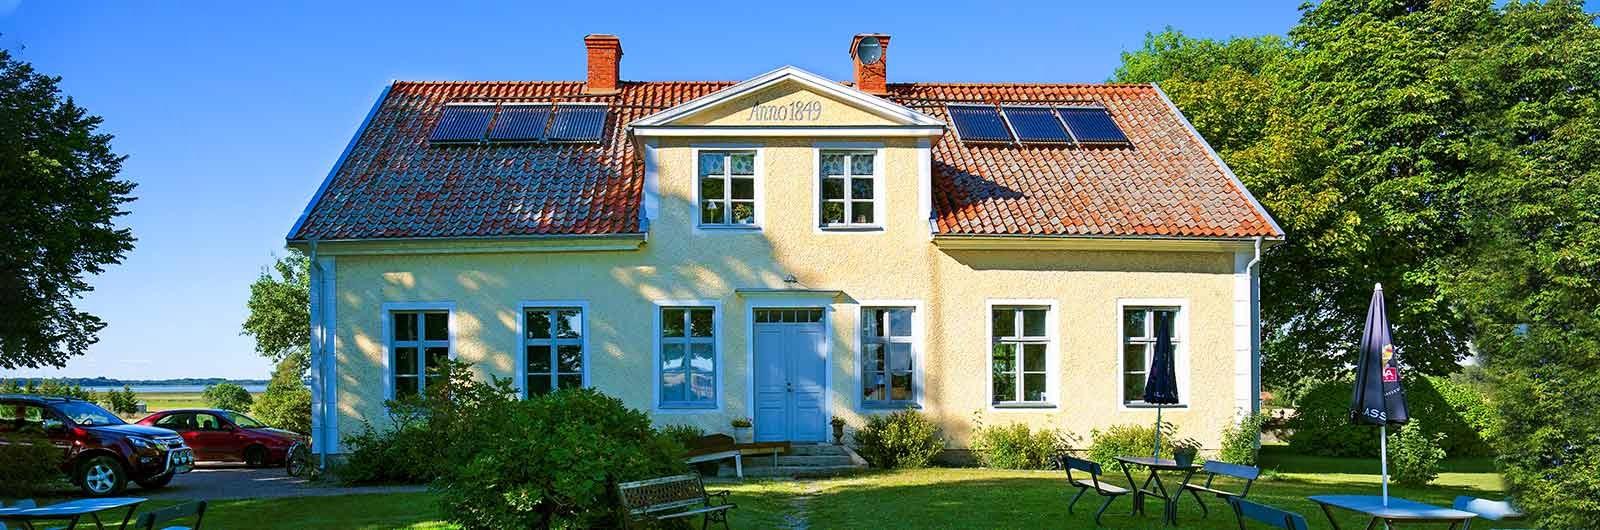 boendetyper gult hus